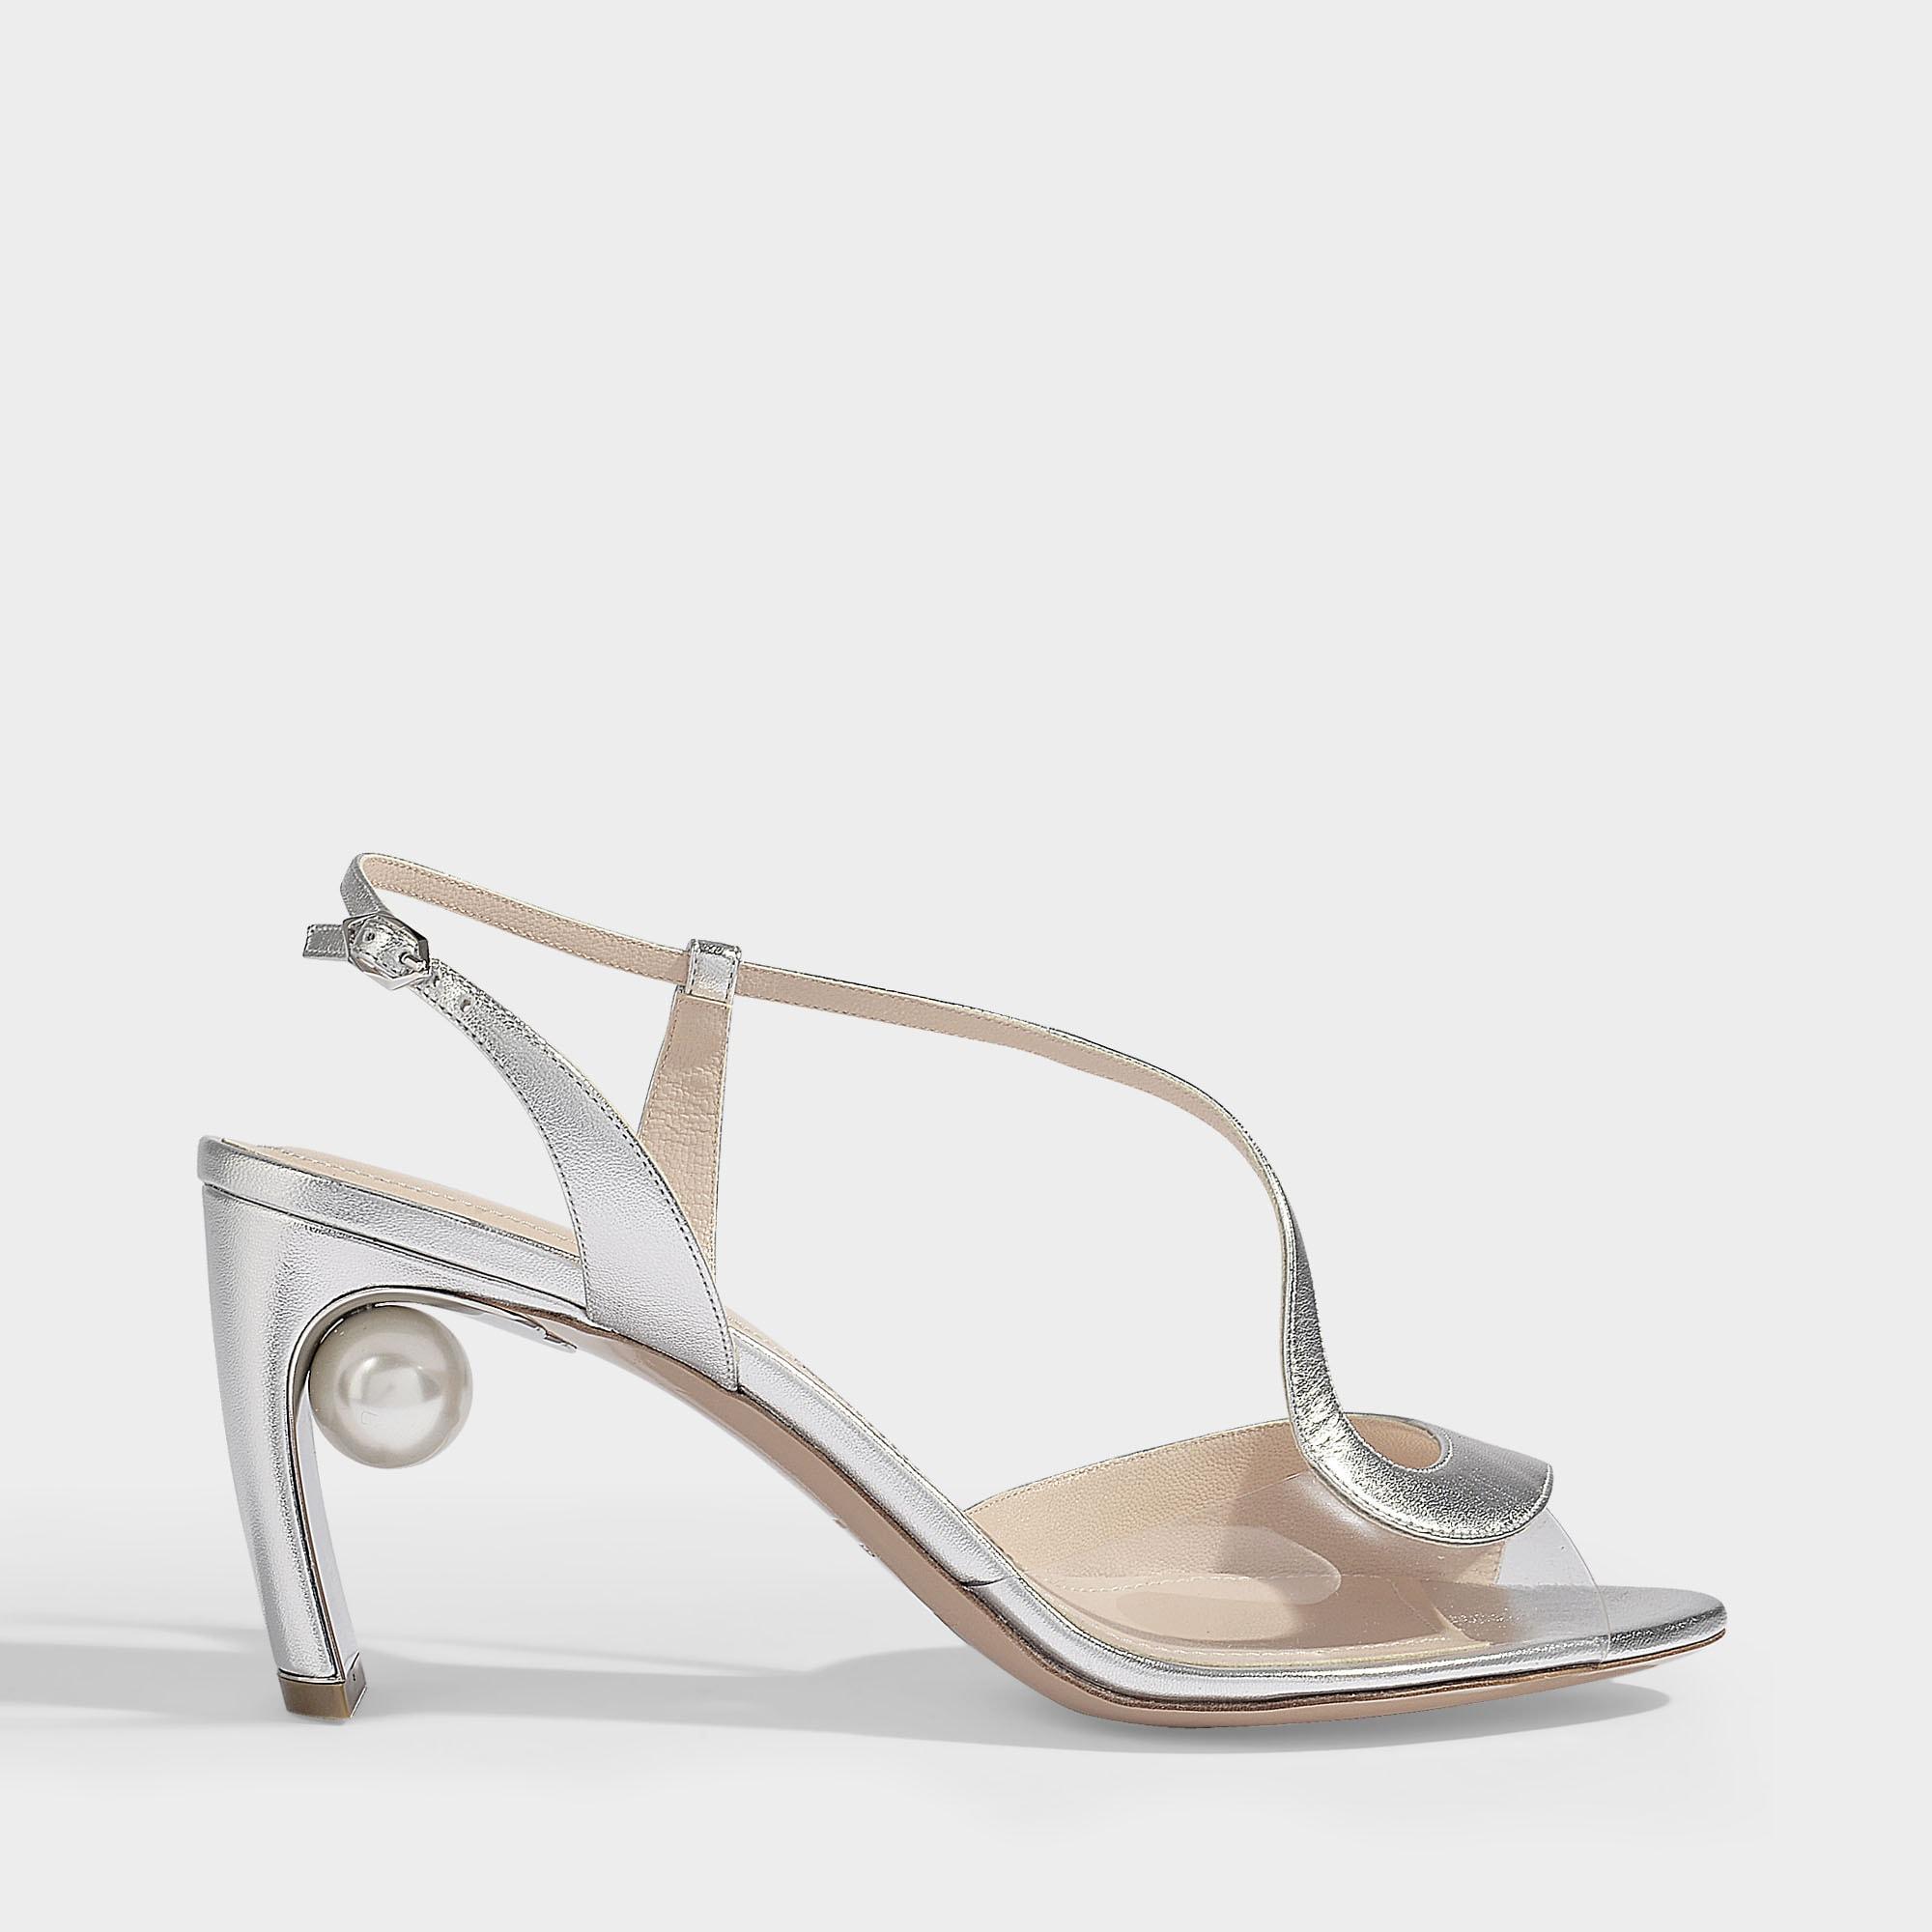 f7e0166aead0 Nicholas Kirkwood. Women s 70mm Maeva Pearl S Sandals In Silver Metallic  Nappa Leather